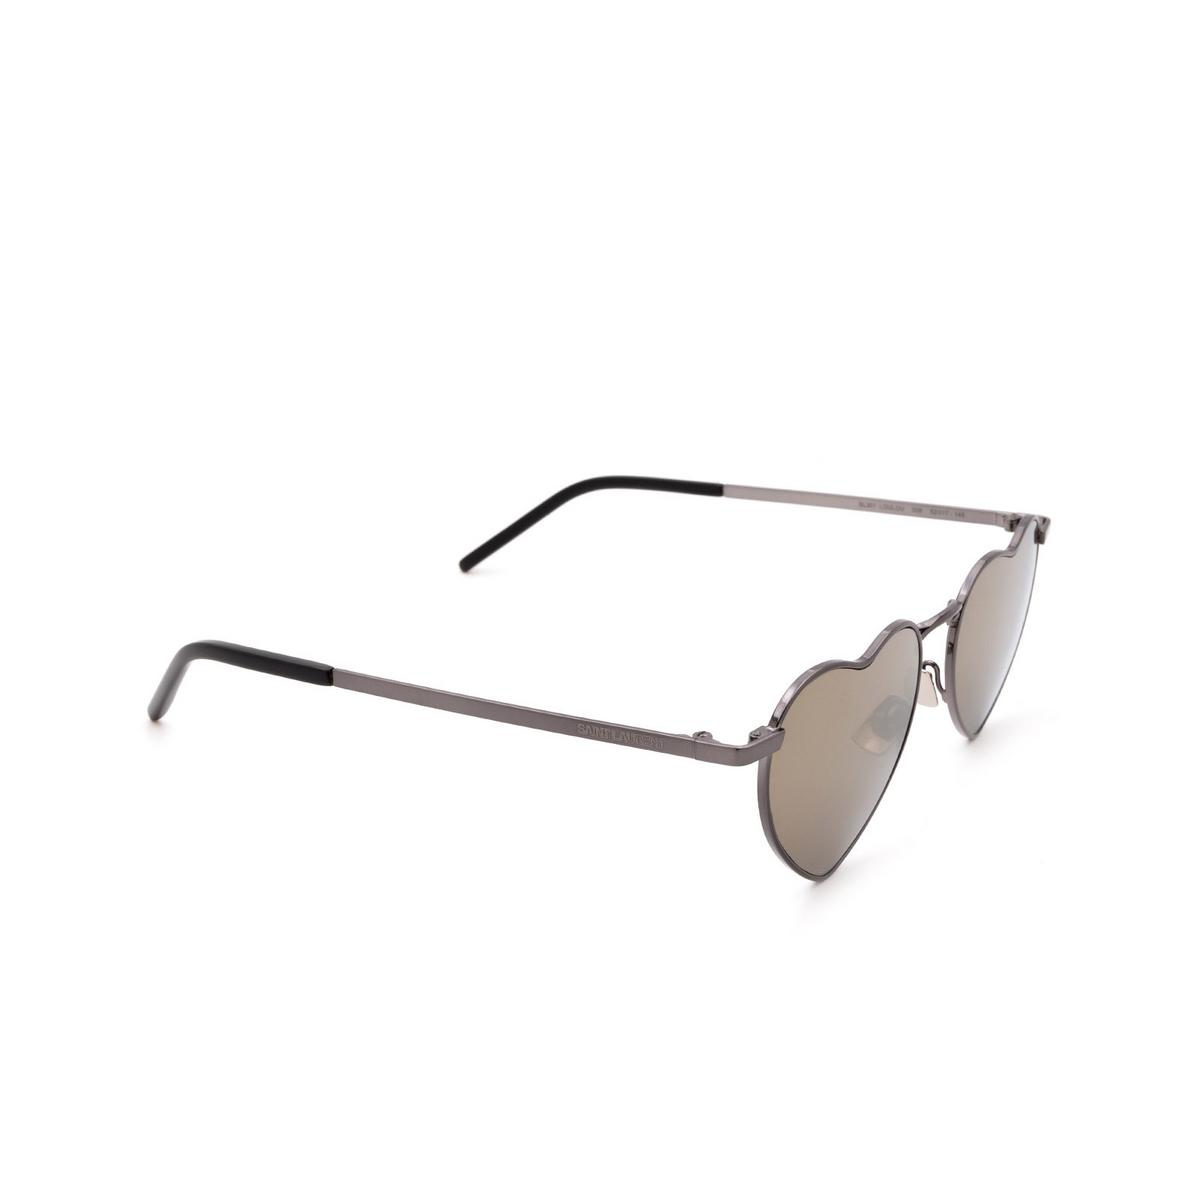 Saint Laurent® Irregular Sunglasses: Loulou SL 301 color Ruthenium 008 - three-quarters view.